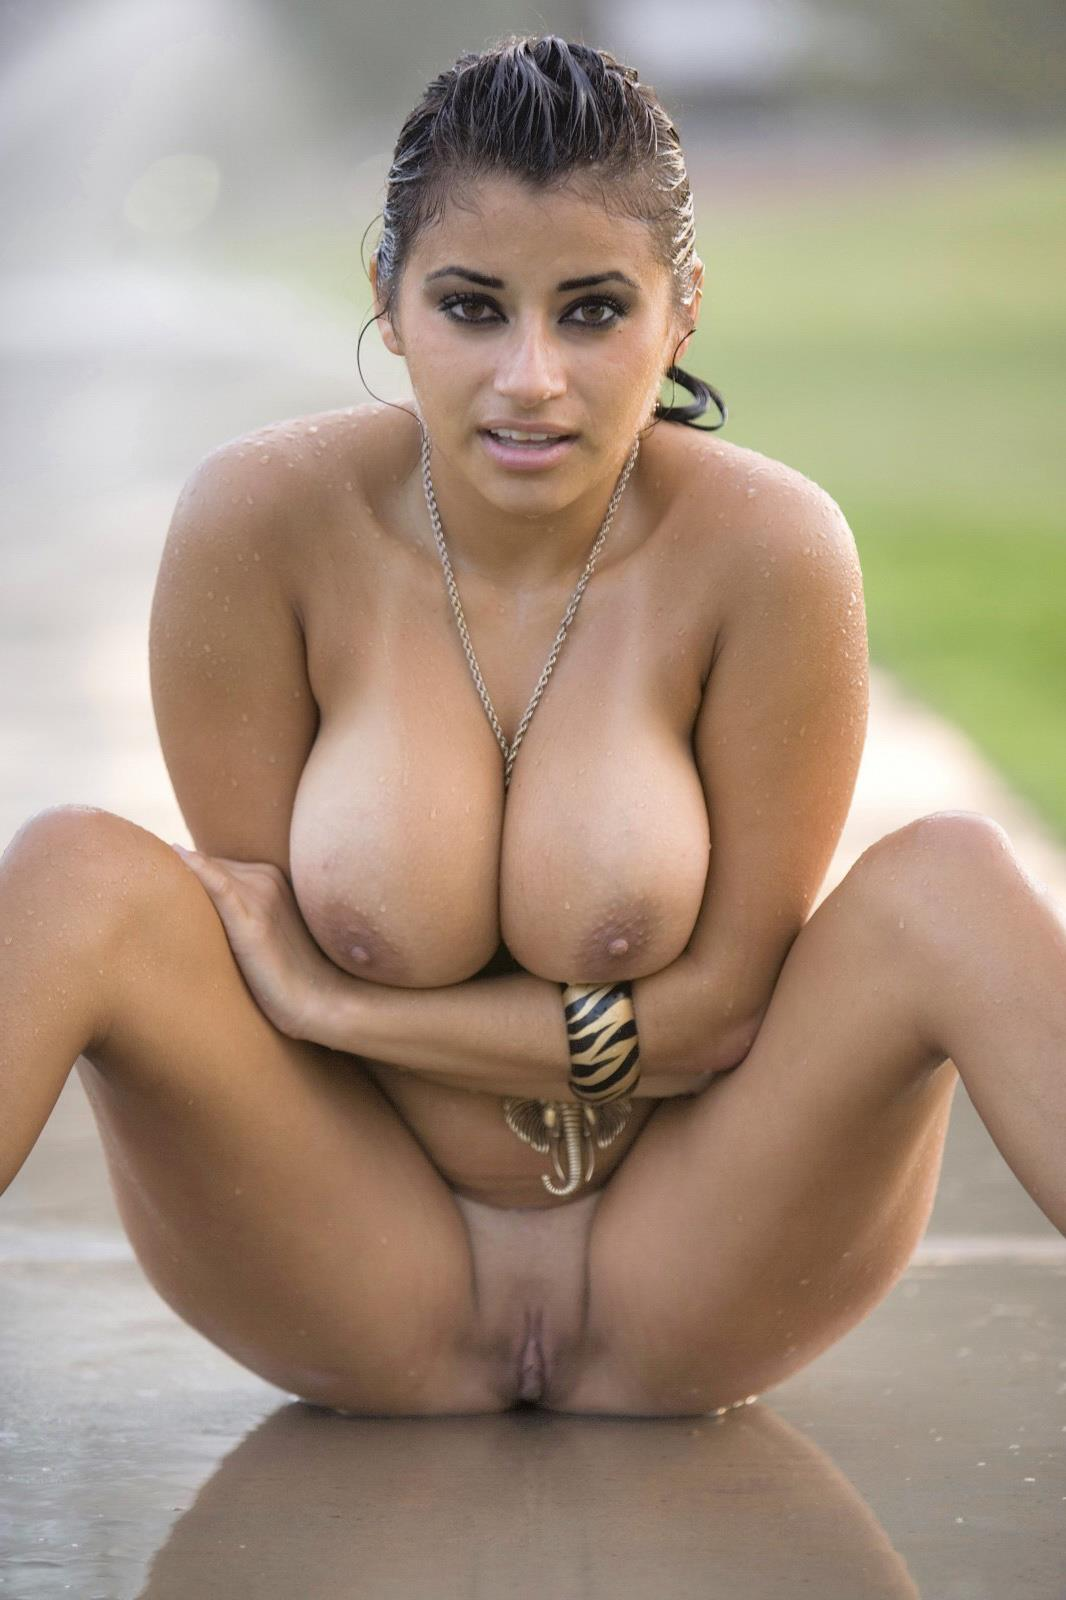 Kim kardashian nudity